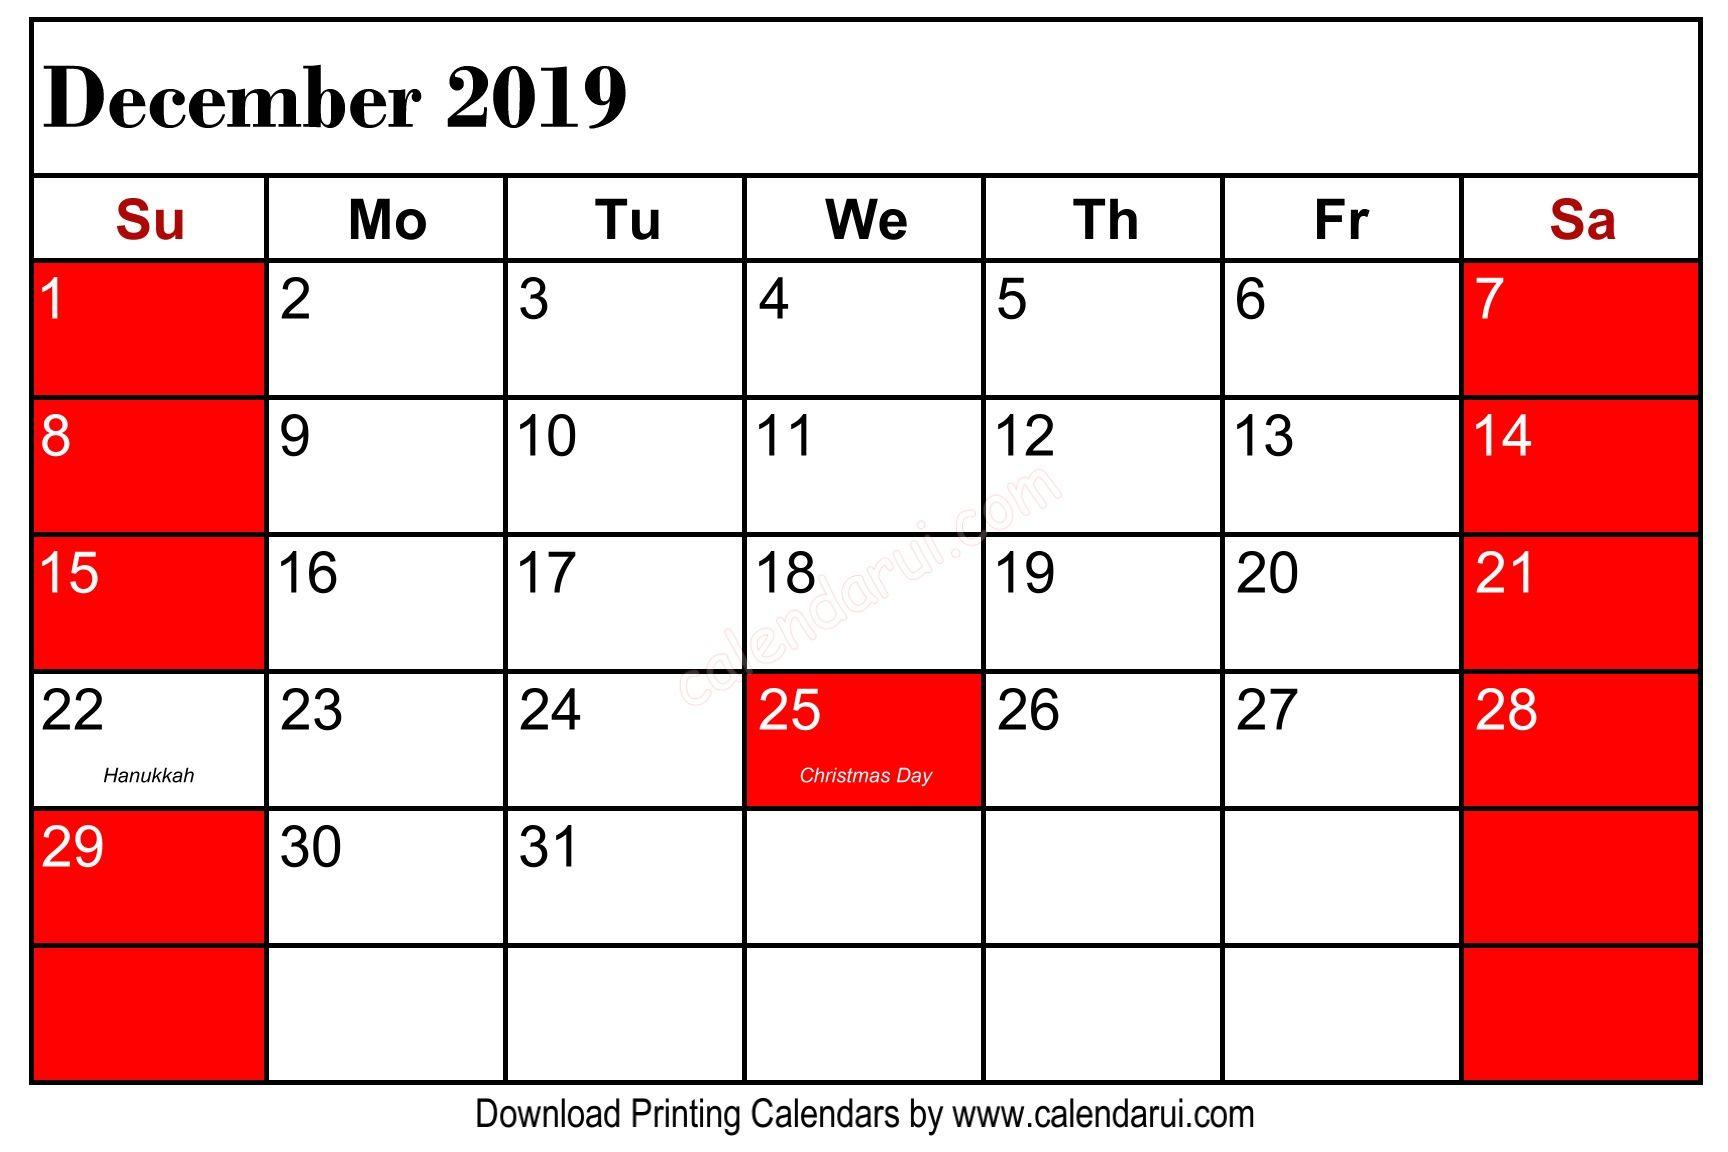 Get Free Download 3 December 2019 Calendar Holidays Printable 1